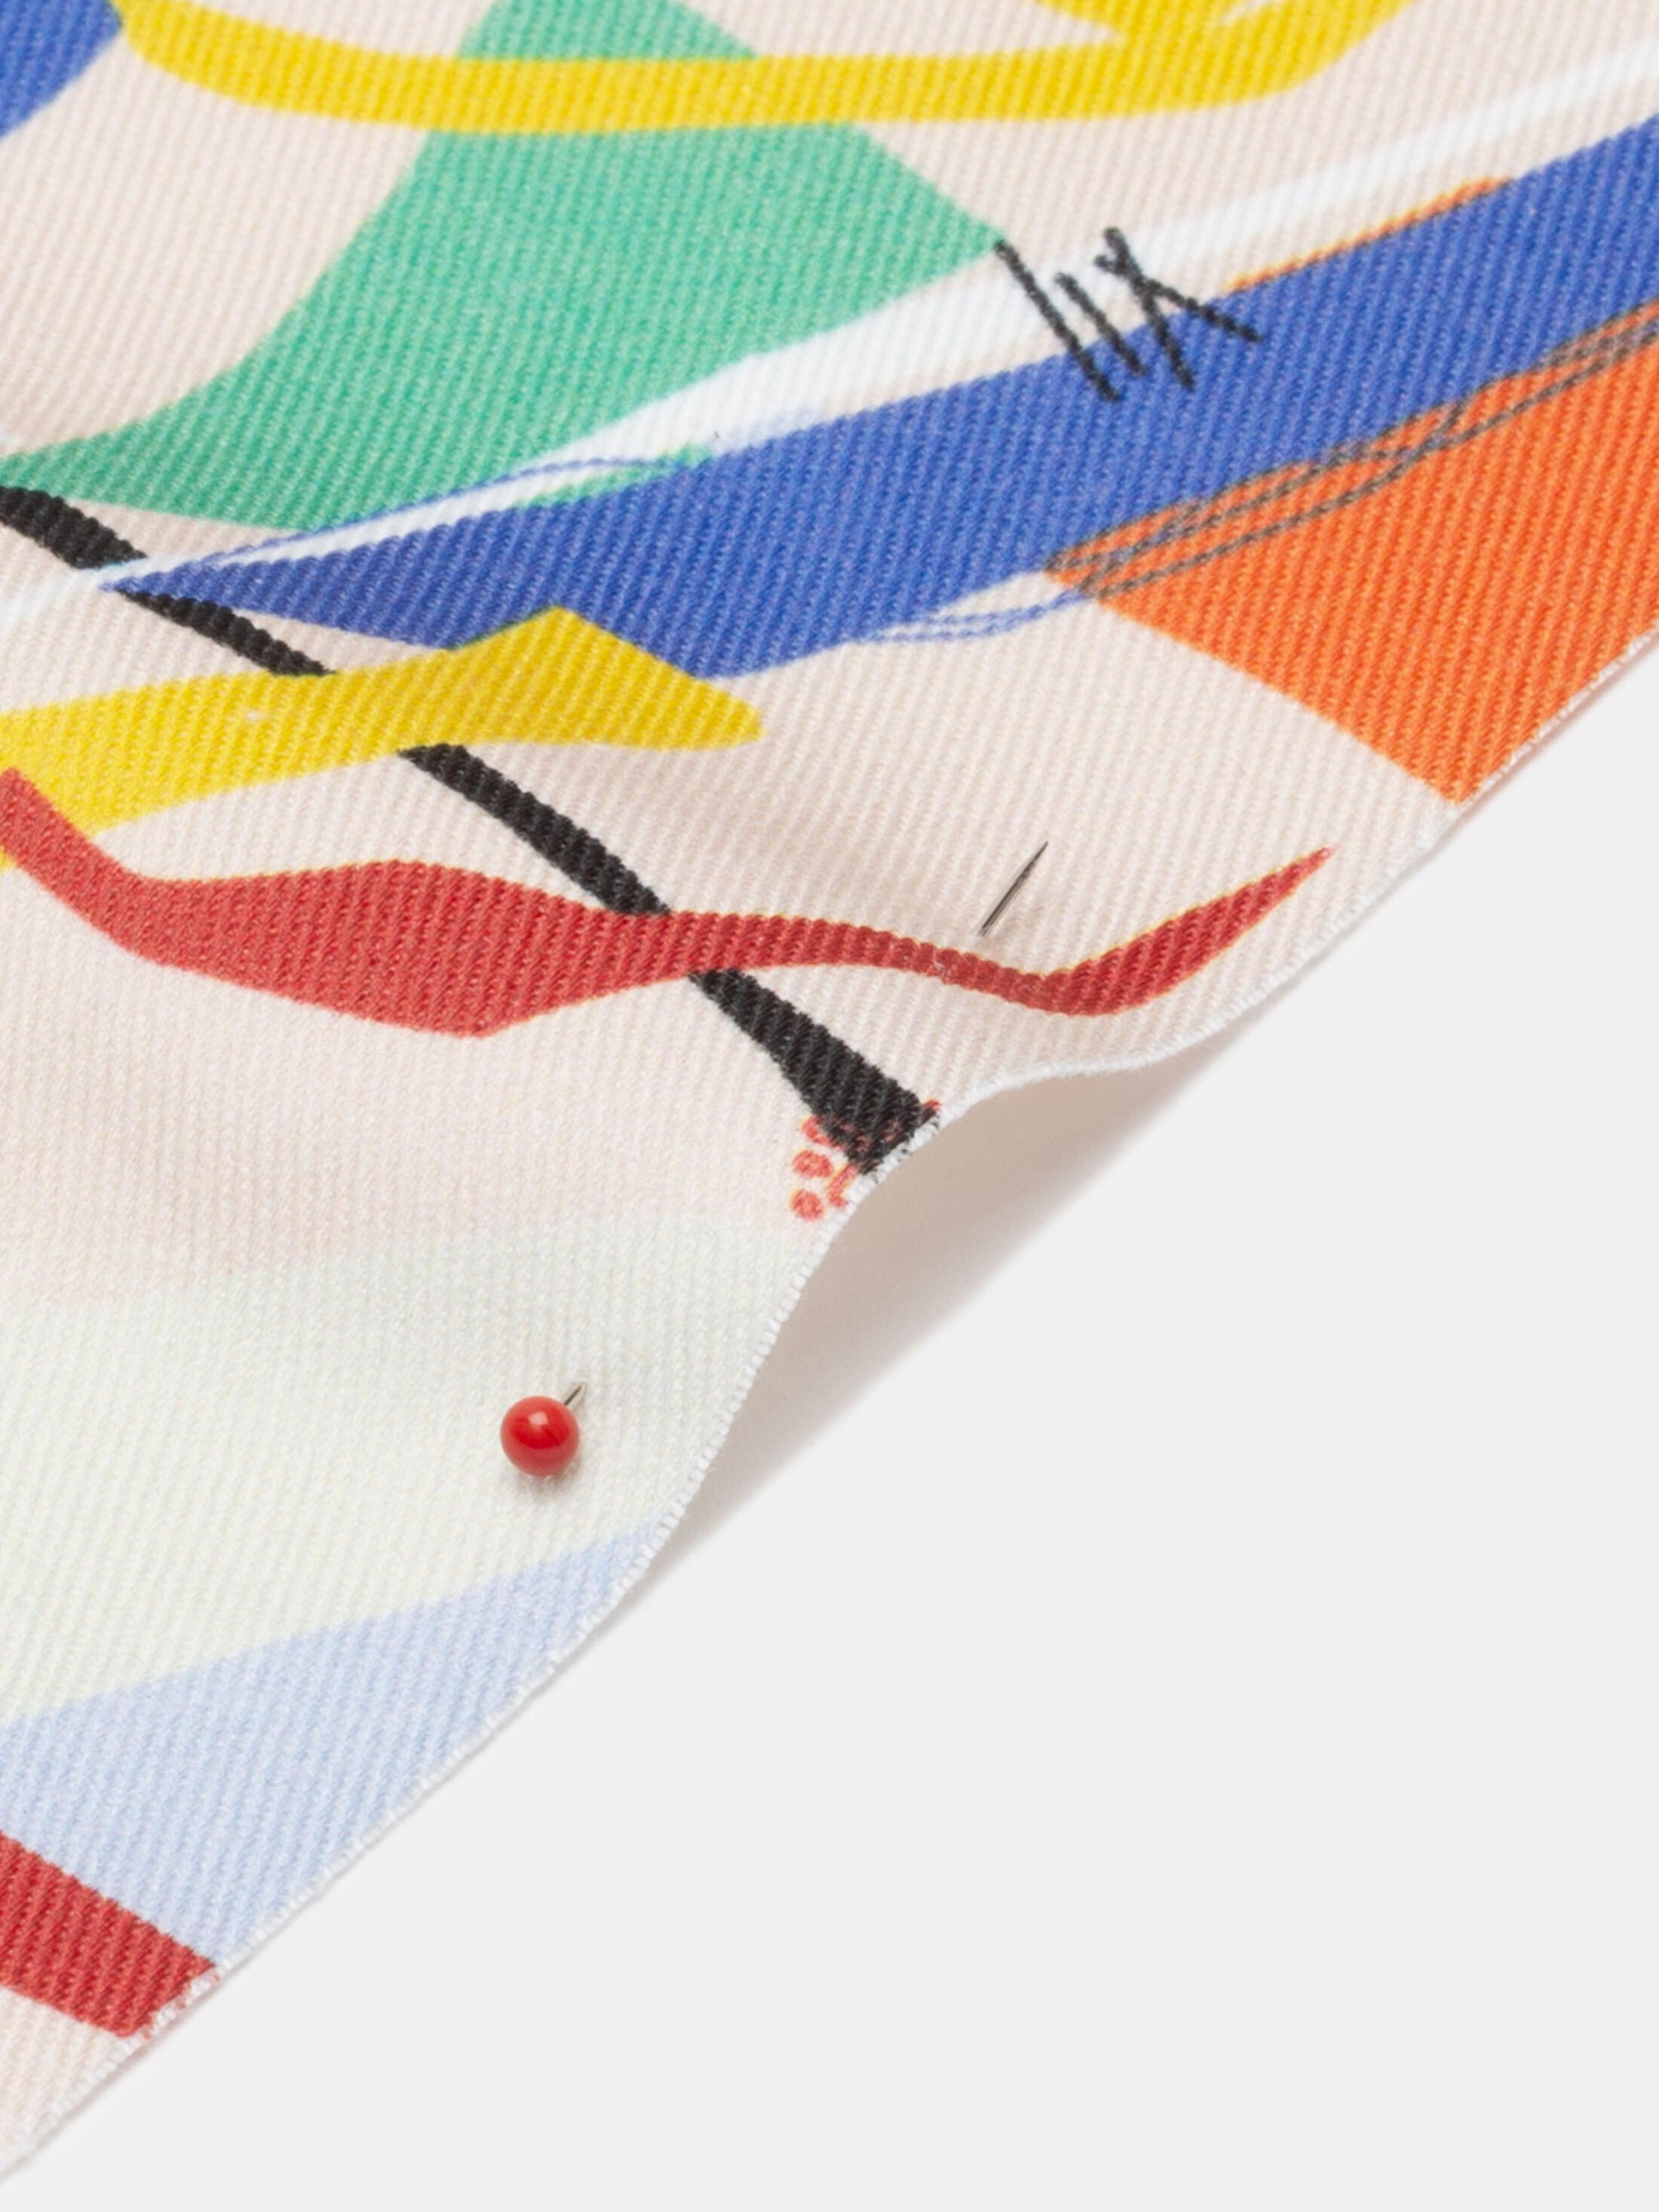 Design Cotton Twill Fabric